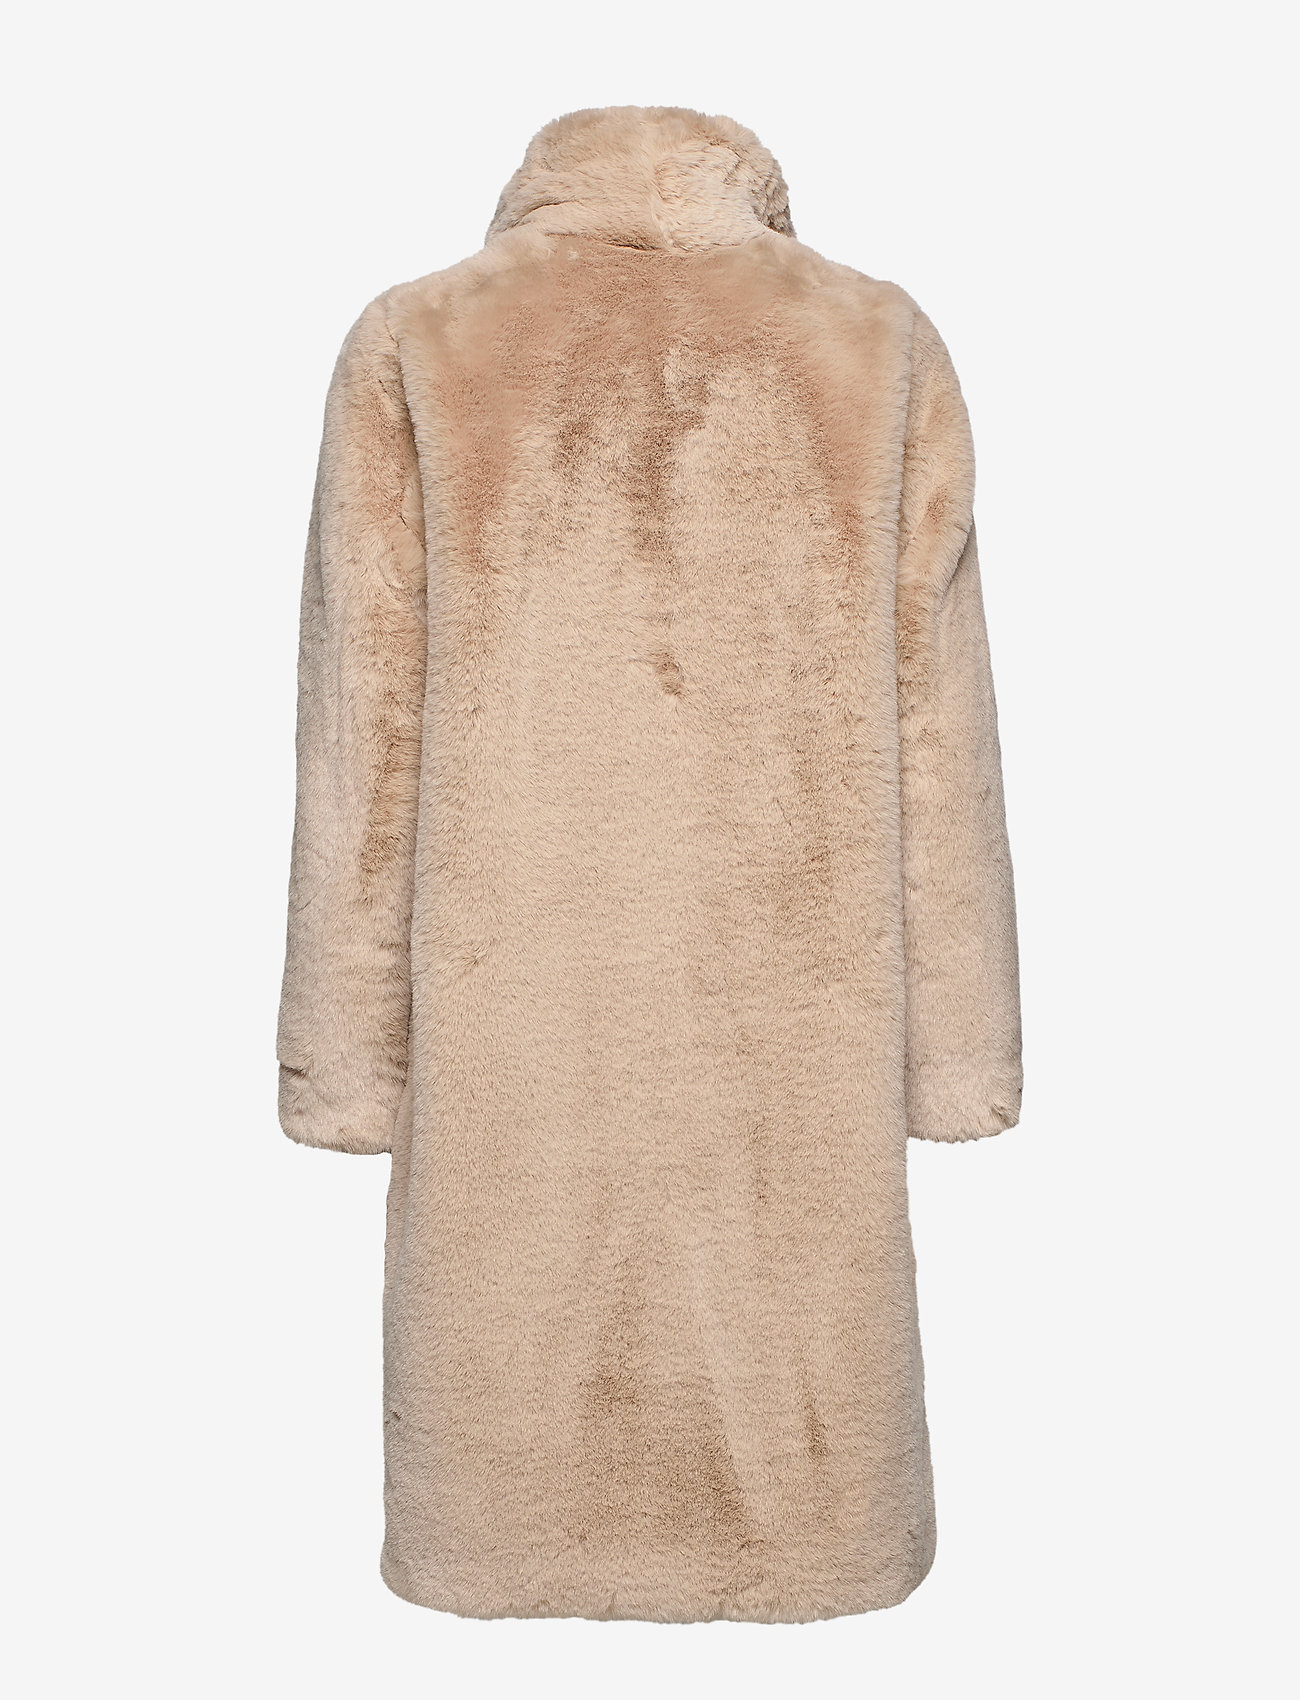 Zantaiw Coat (French Nougat) (1680 kr) - InWear